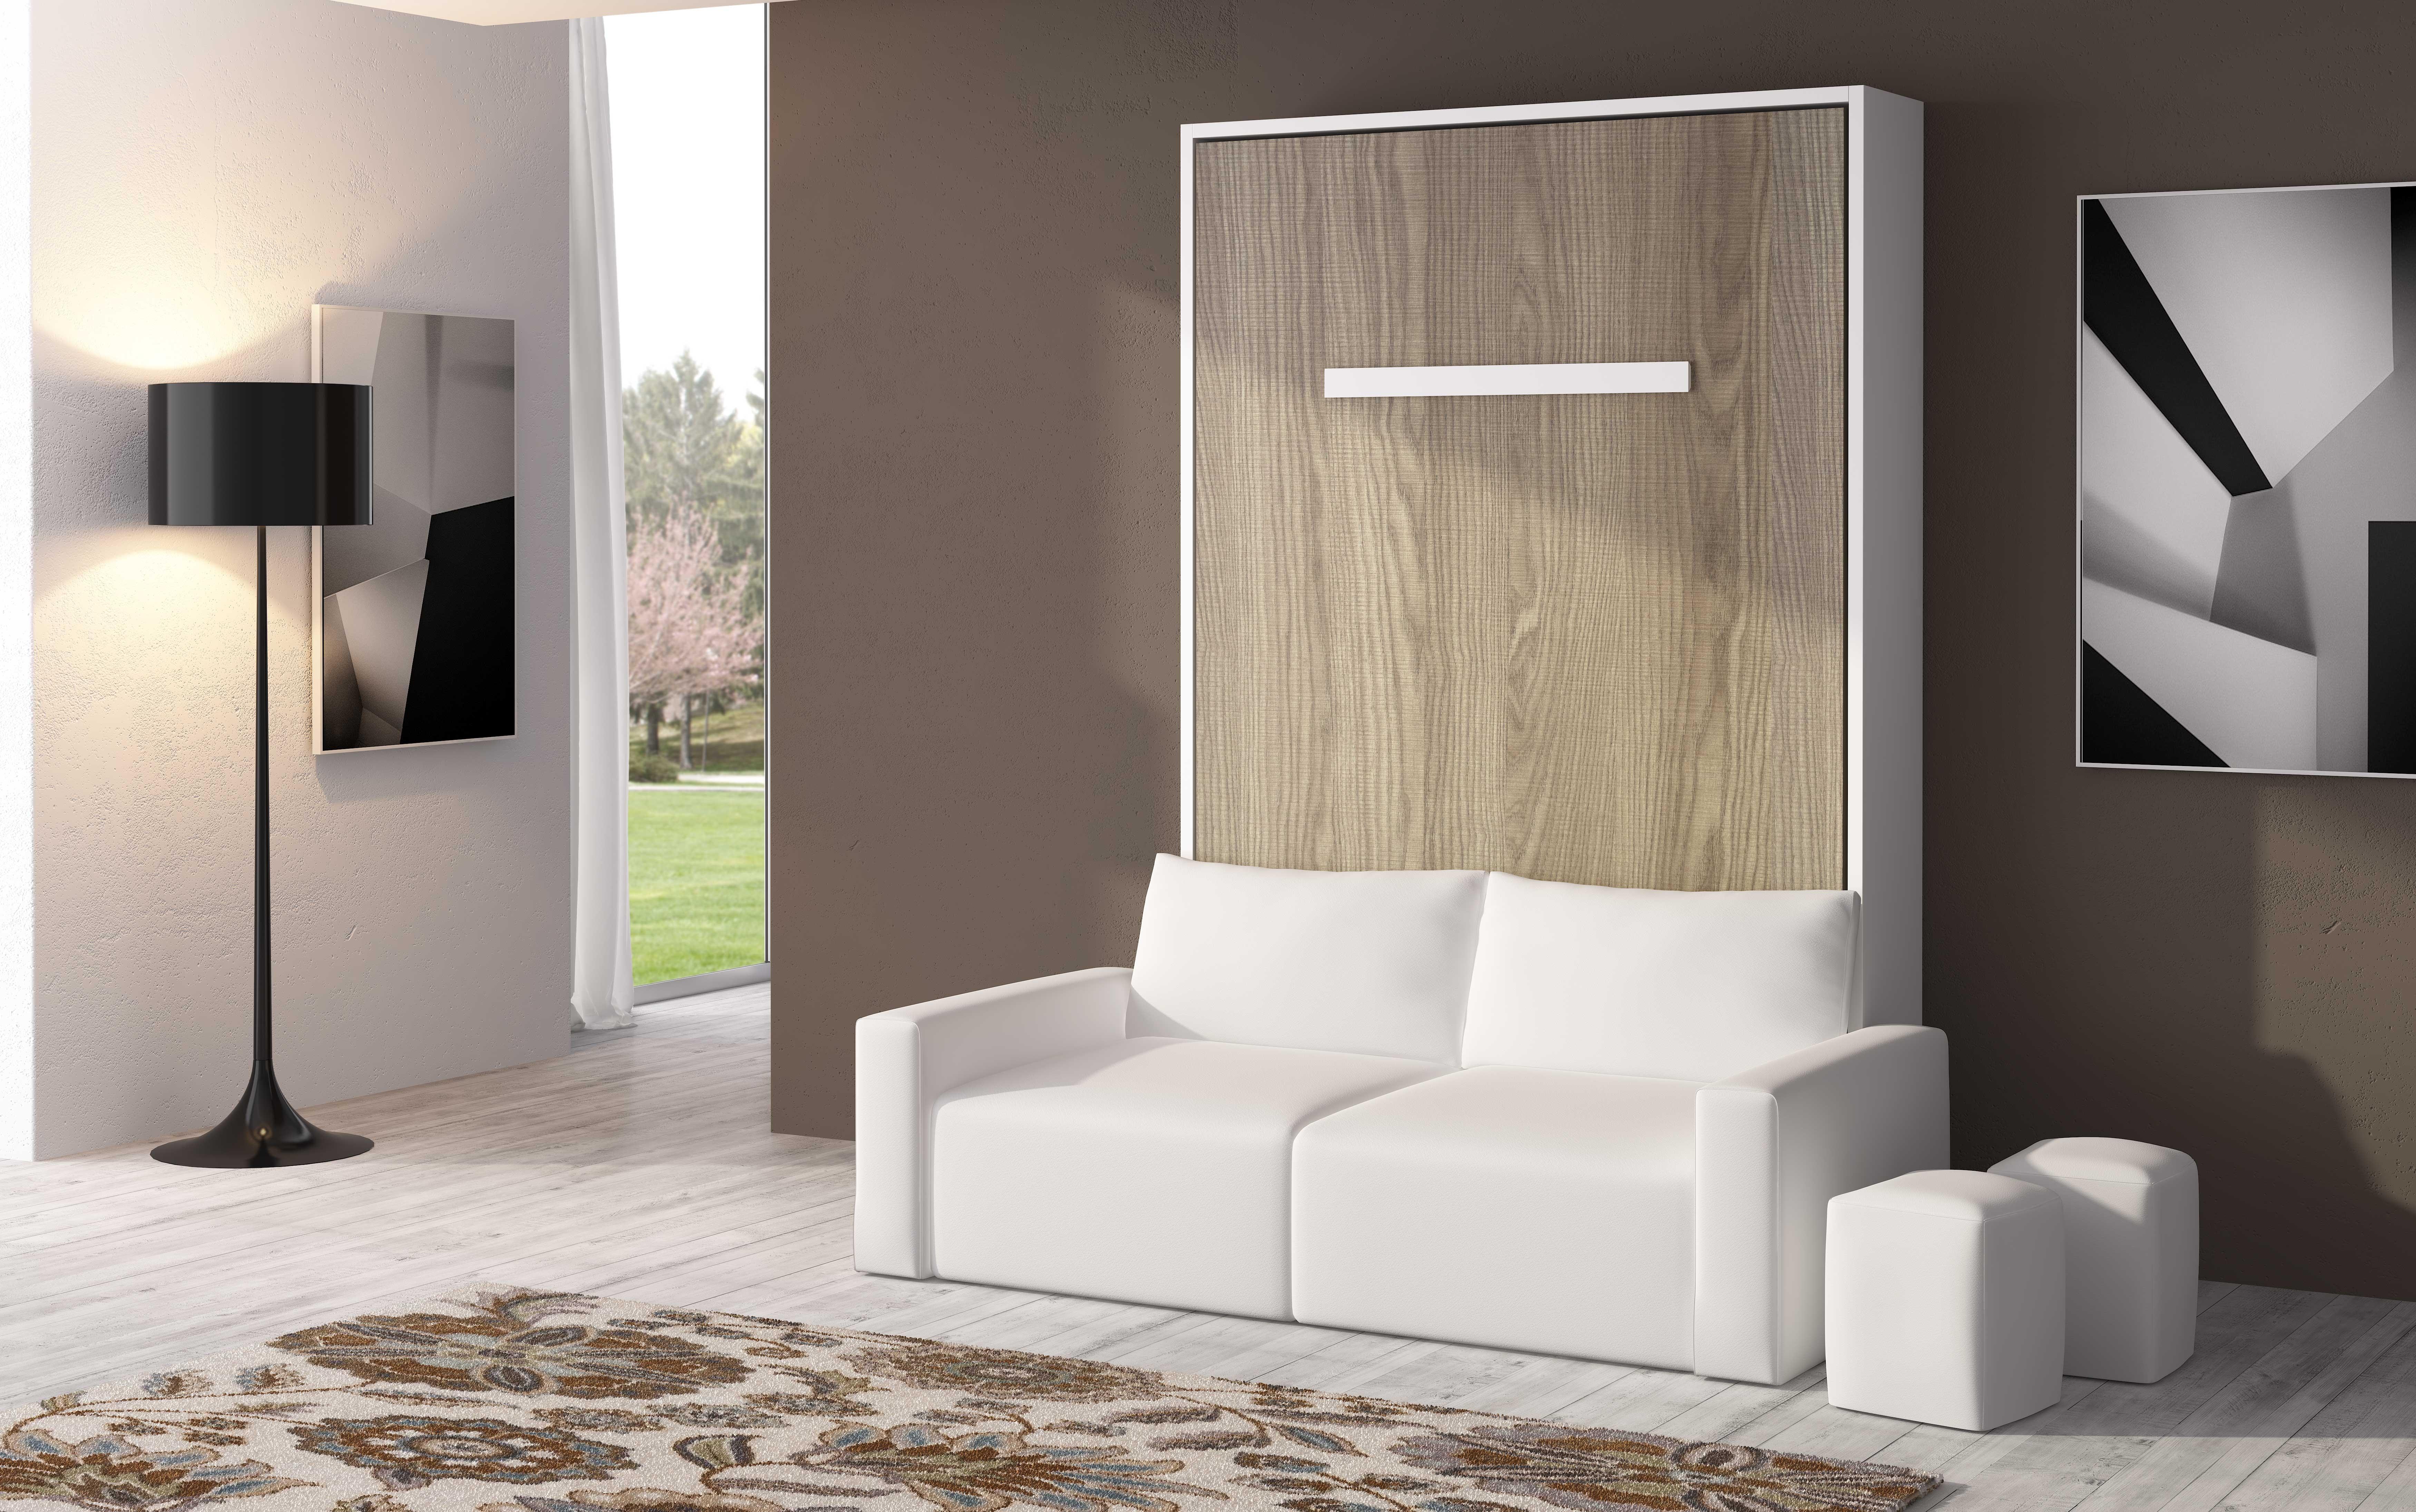 armoire lit escamotable verticale canap coffre espacia 140 facade blanc canap anthracite. Black Bedroom Furniture Sets. Home Design Ideas